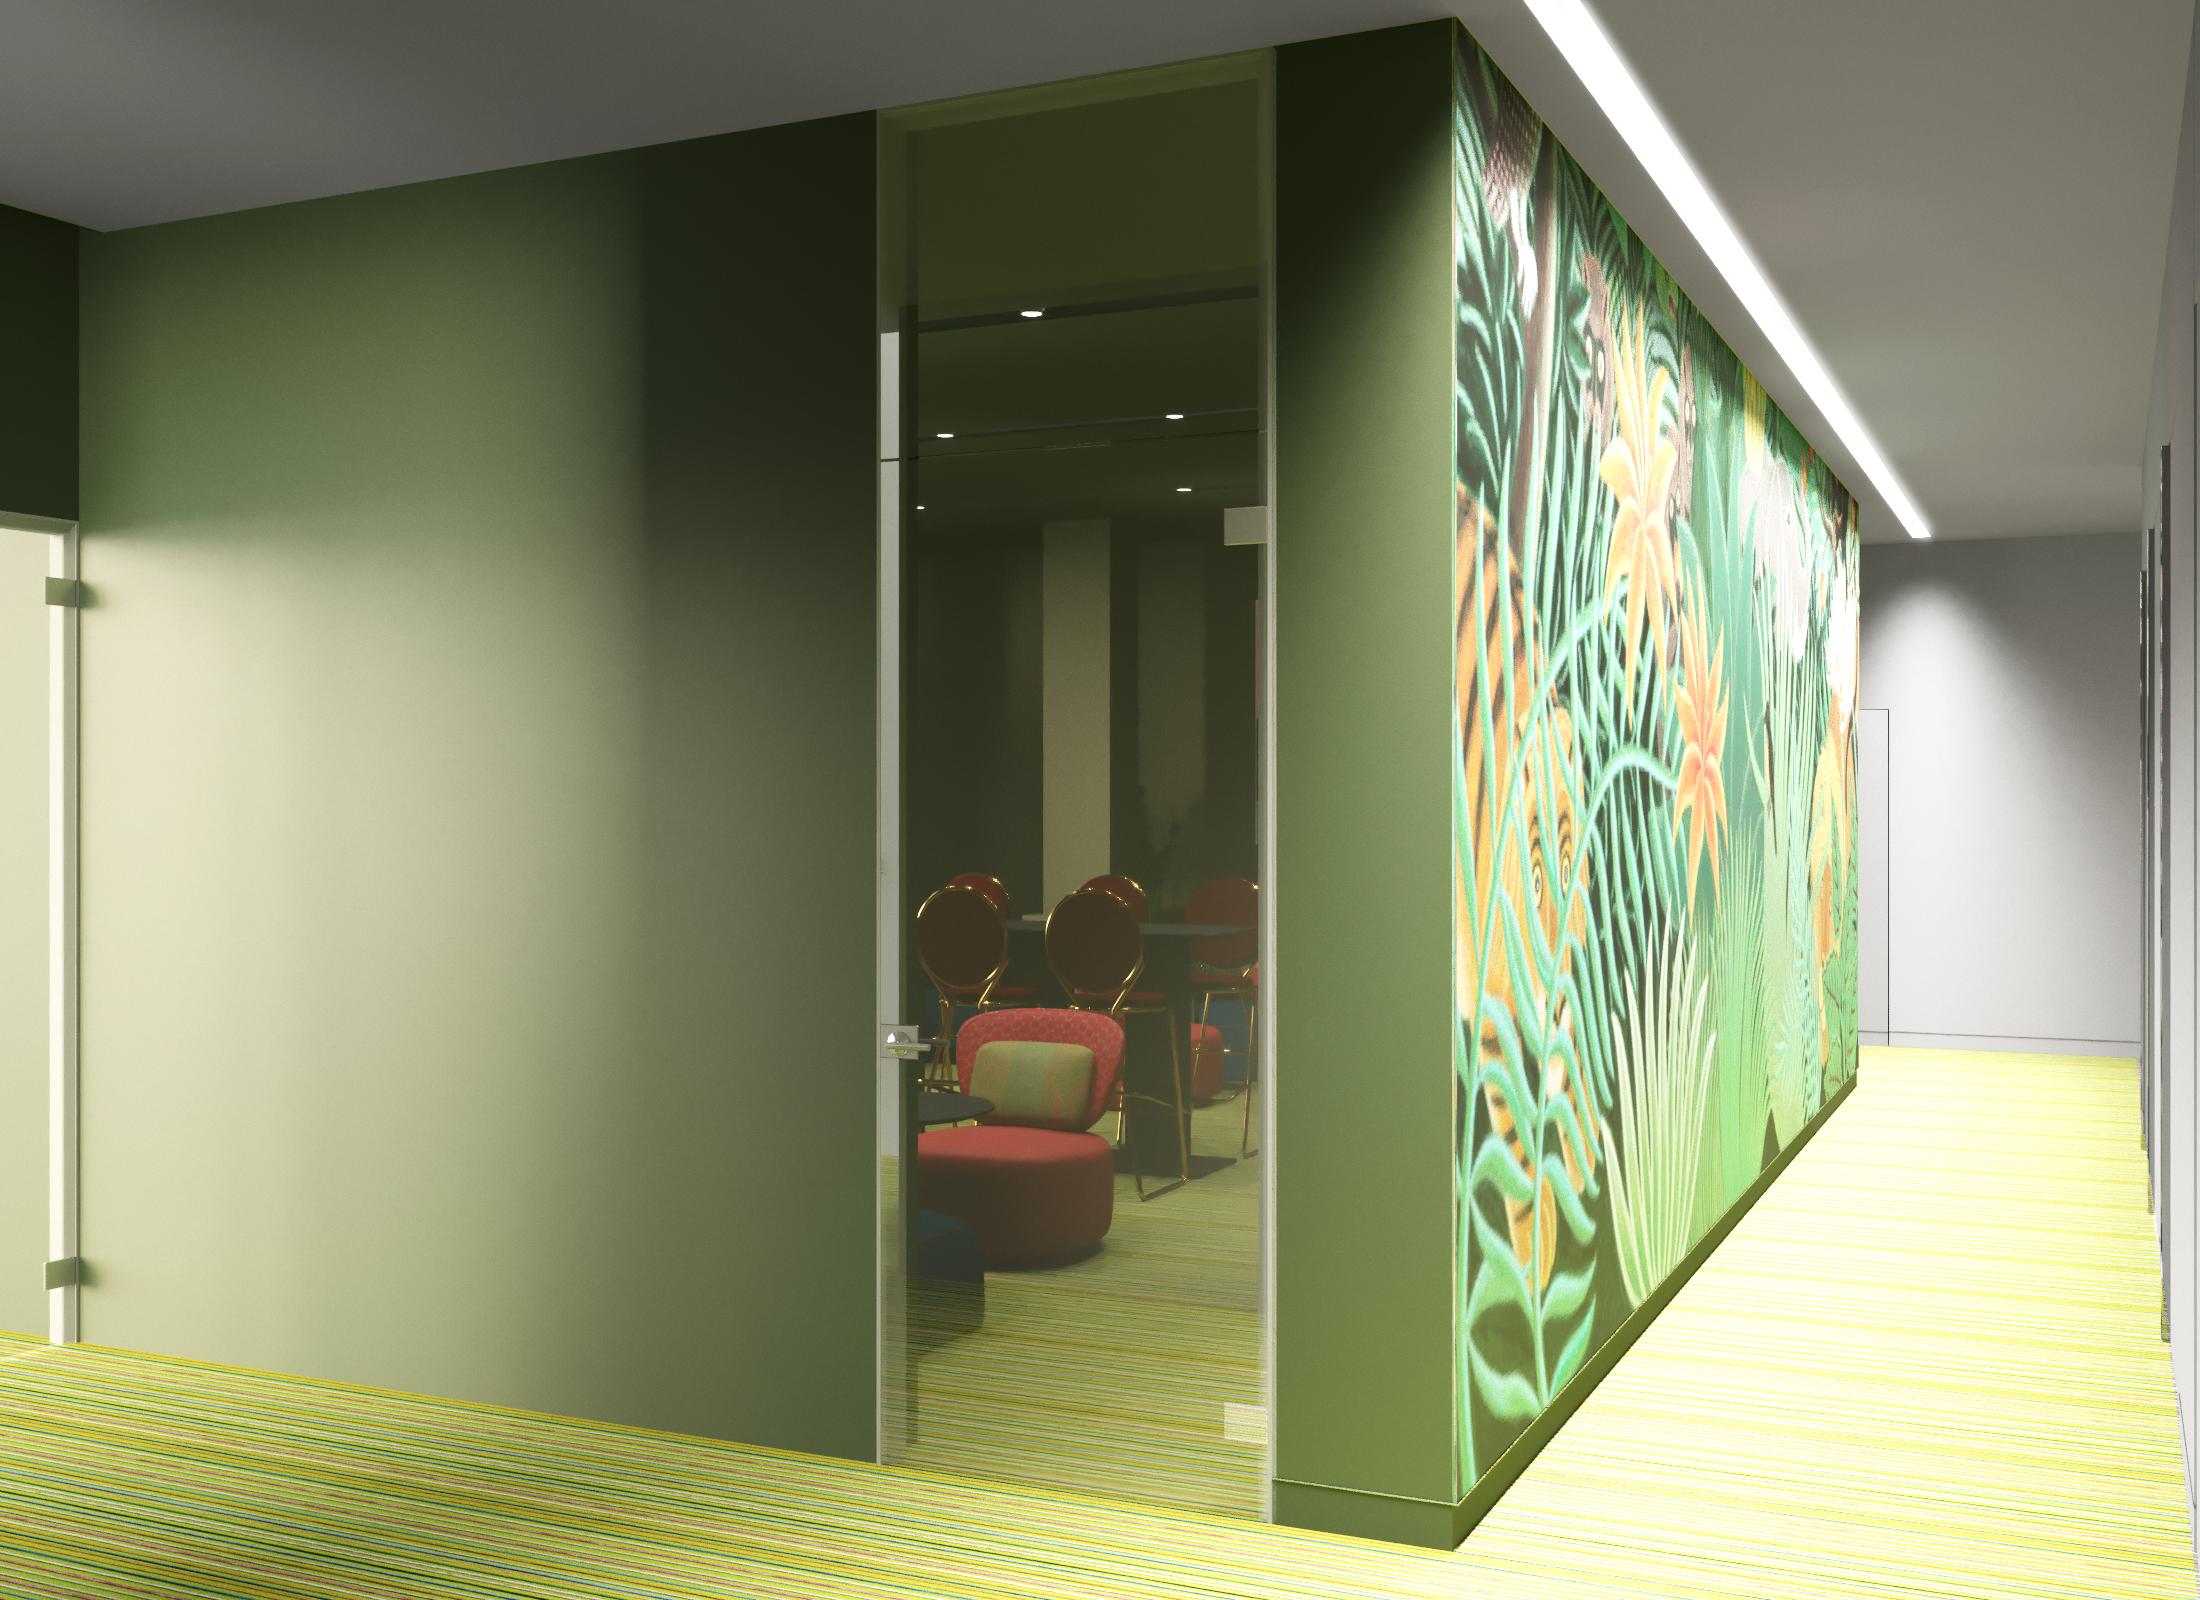 5th floor hall